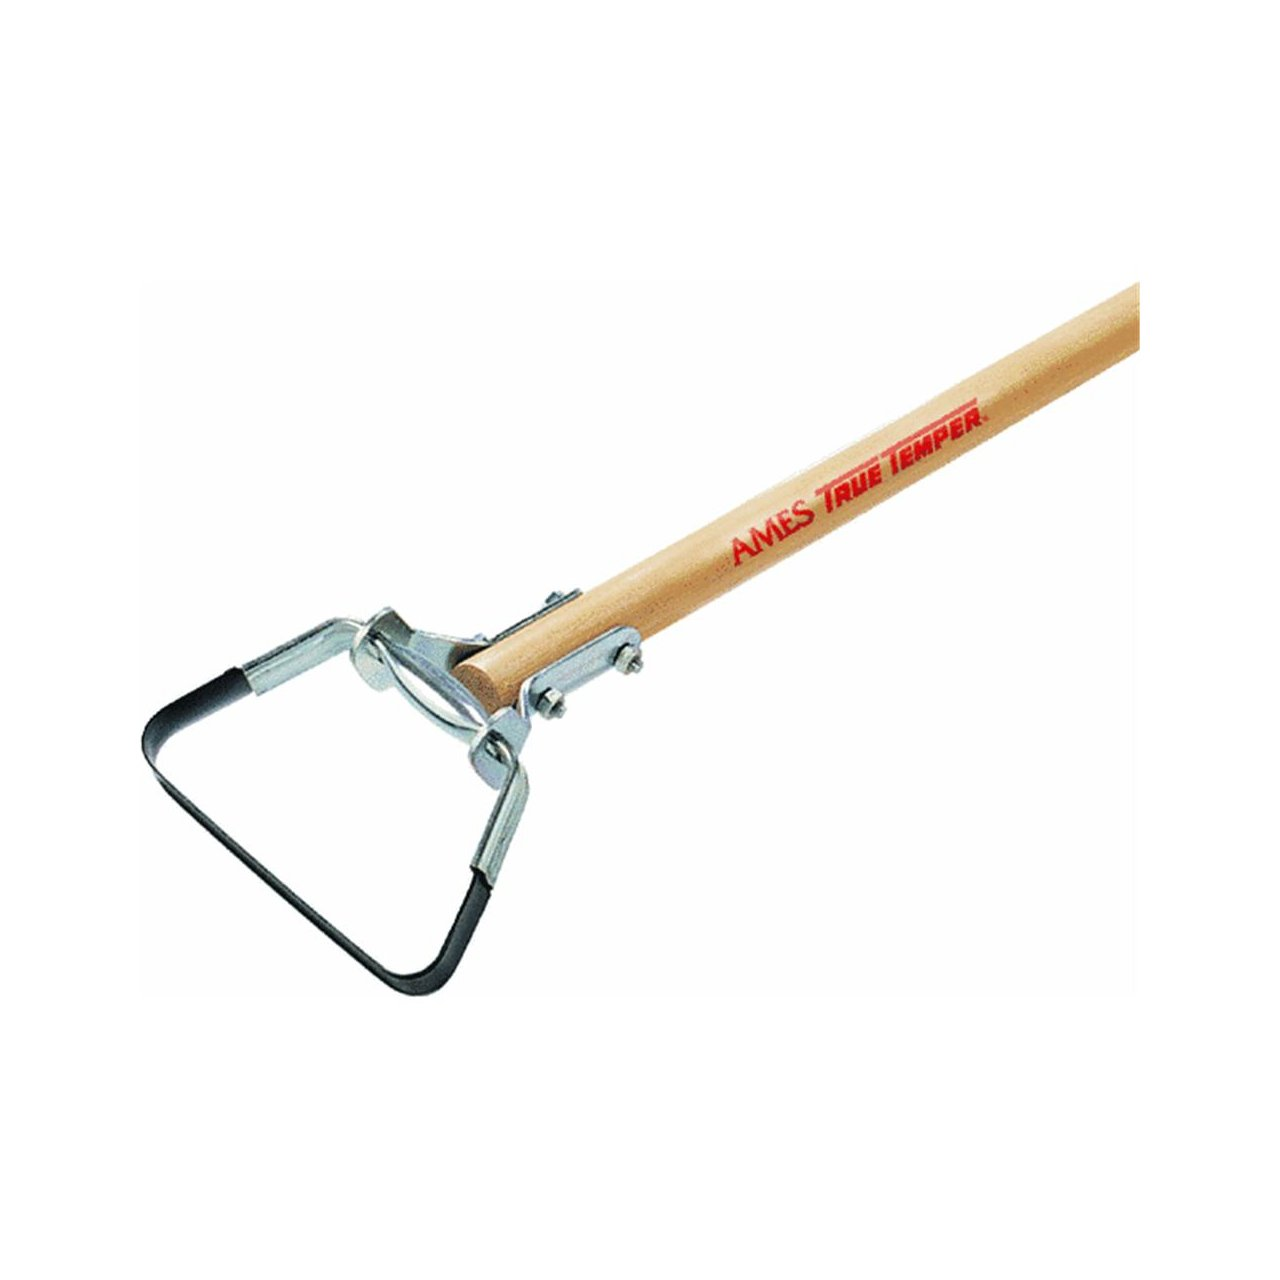 Amazon.com : True Temper Action Hoe   1866300 : Garden Hoes : Garden U0026  Outdoor